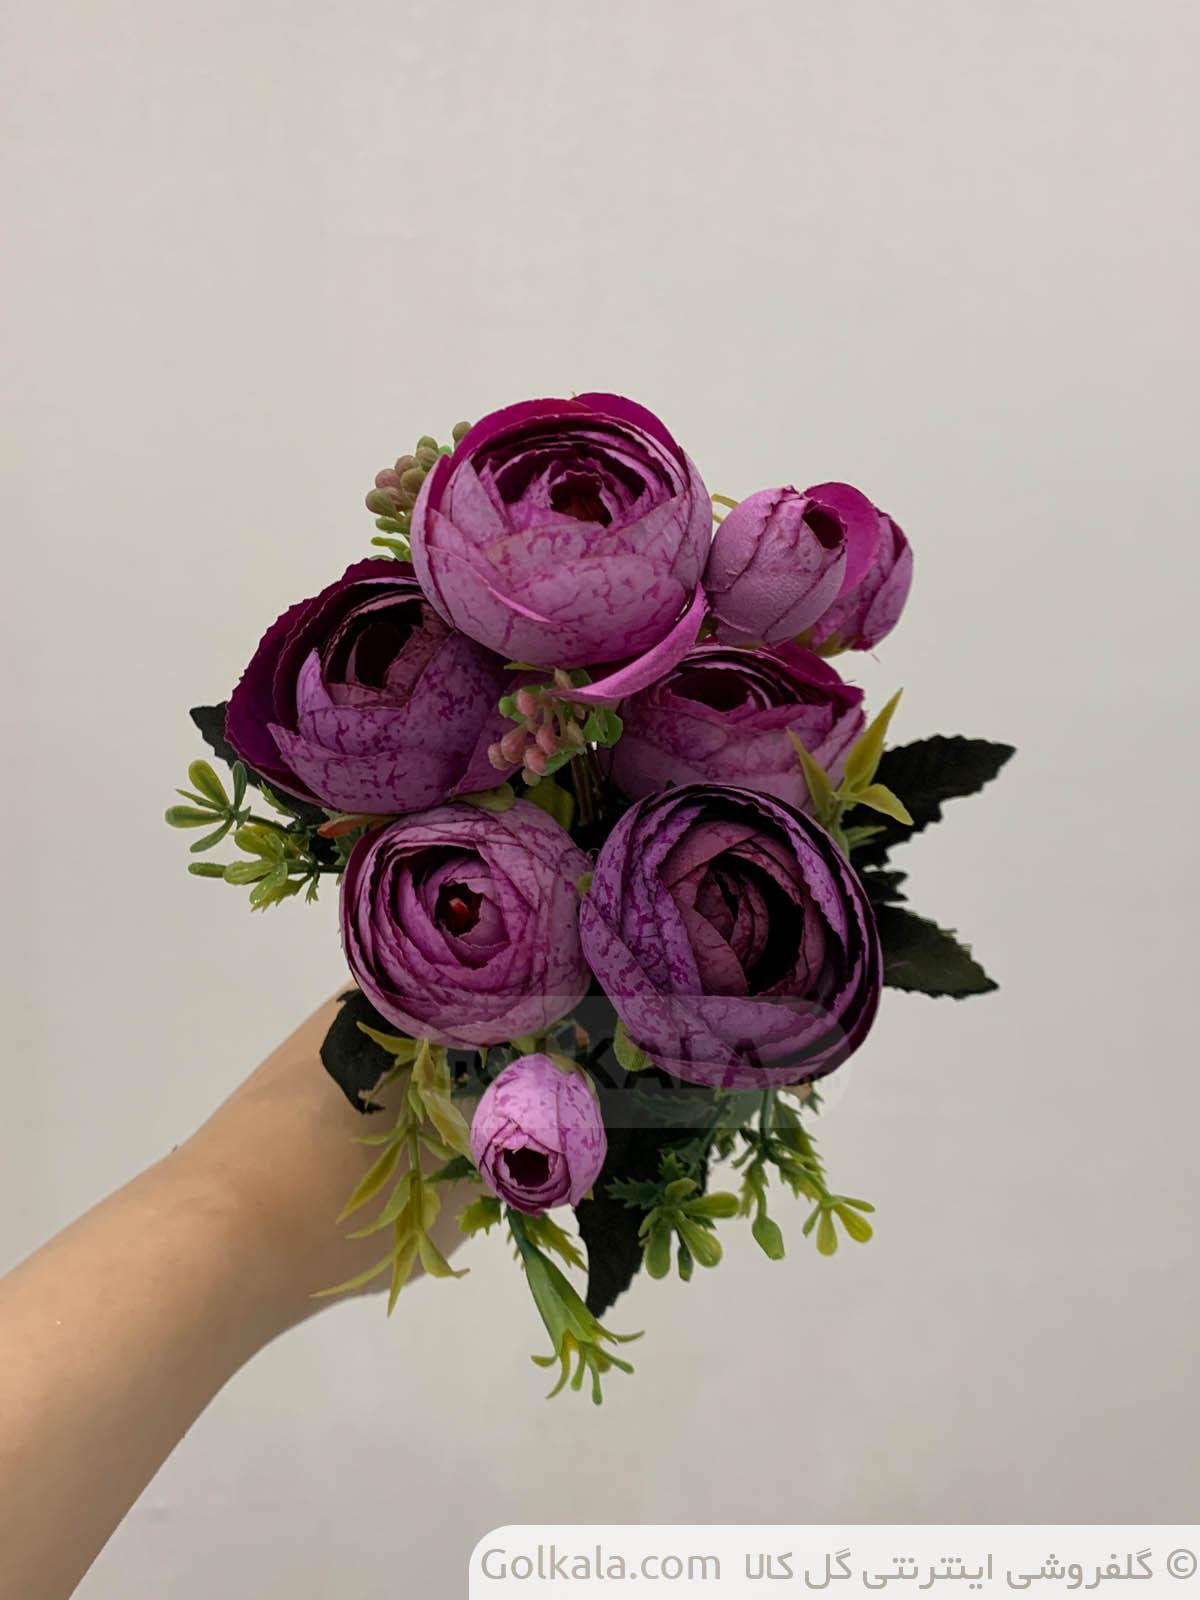 پیونی بنفش دو گل کالا